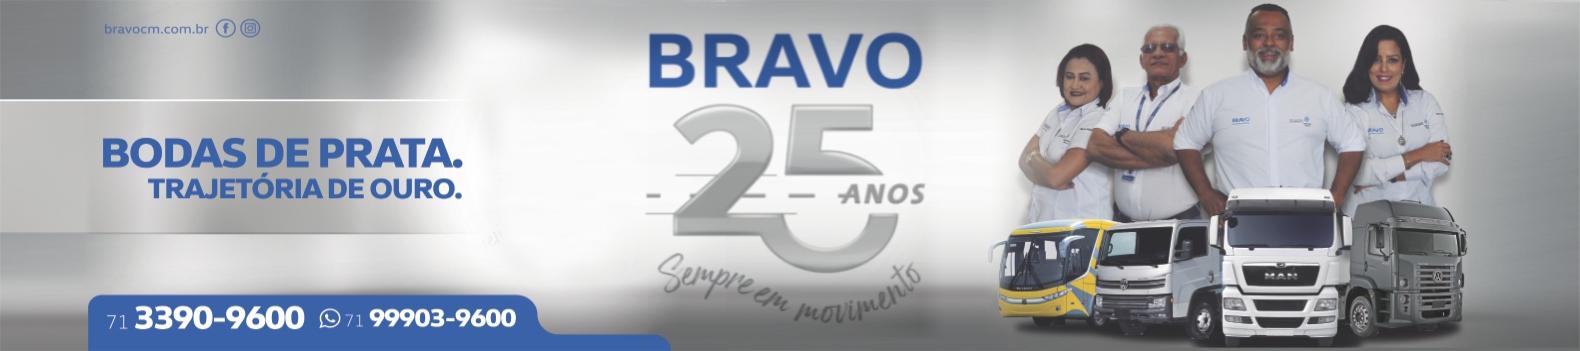 BRAVO